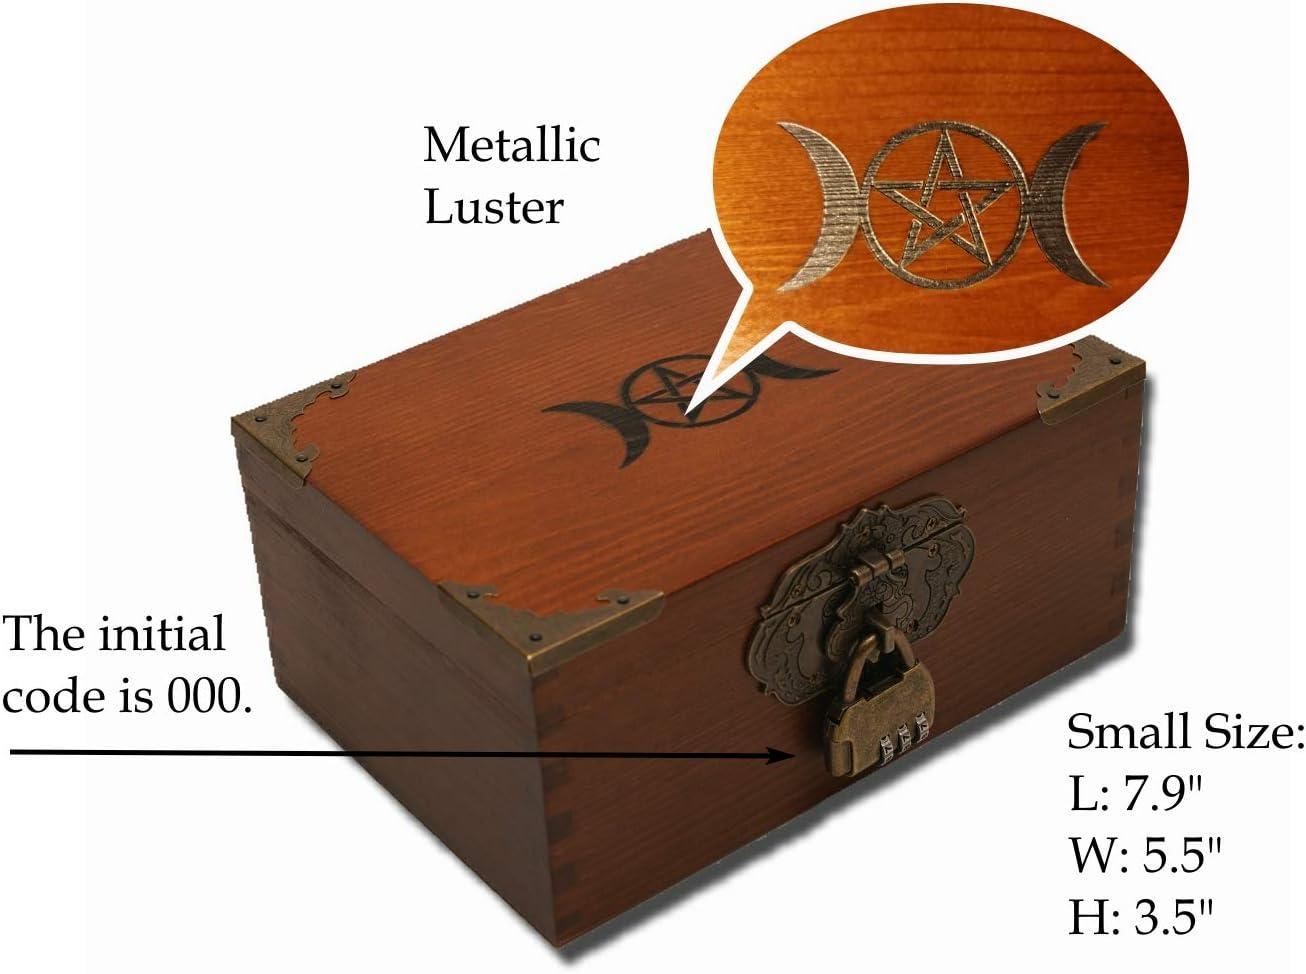 7 Pentagram Wood Carved Box Crystal Box 5 Point Star Flowers Hand Carved Storage Box Jewelry Box